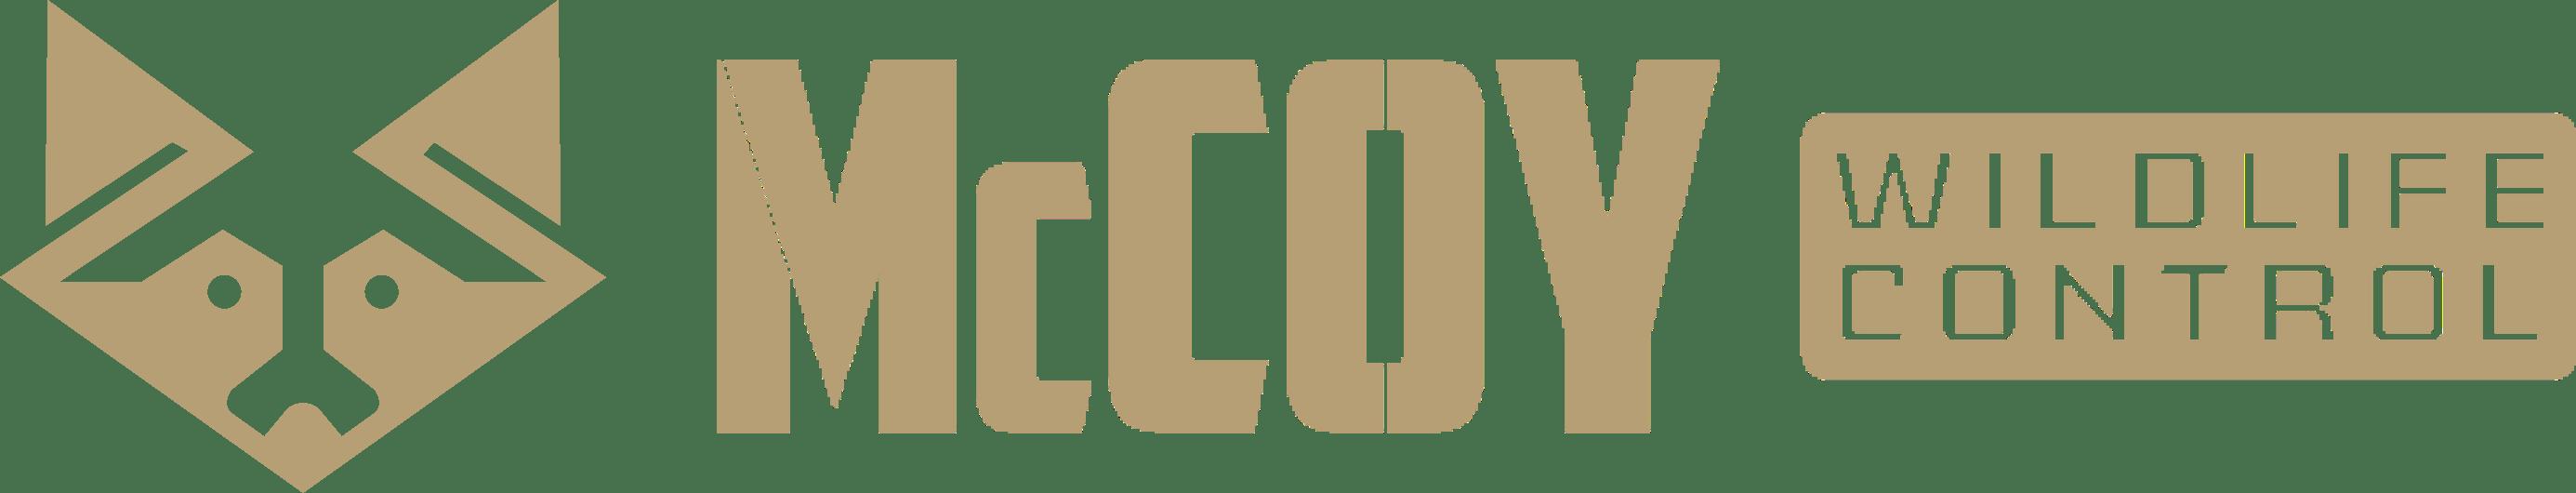 McCoy Wildlife Control Text Logo Full